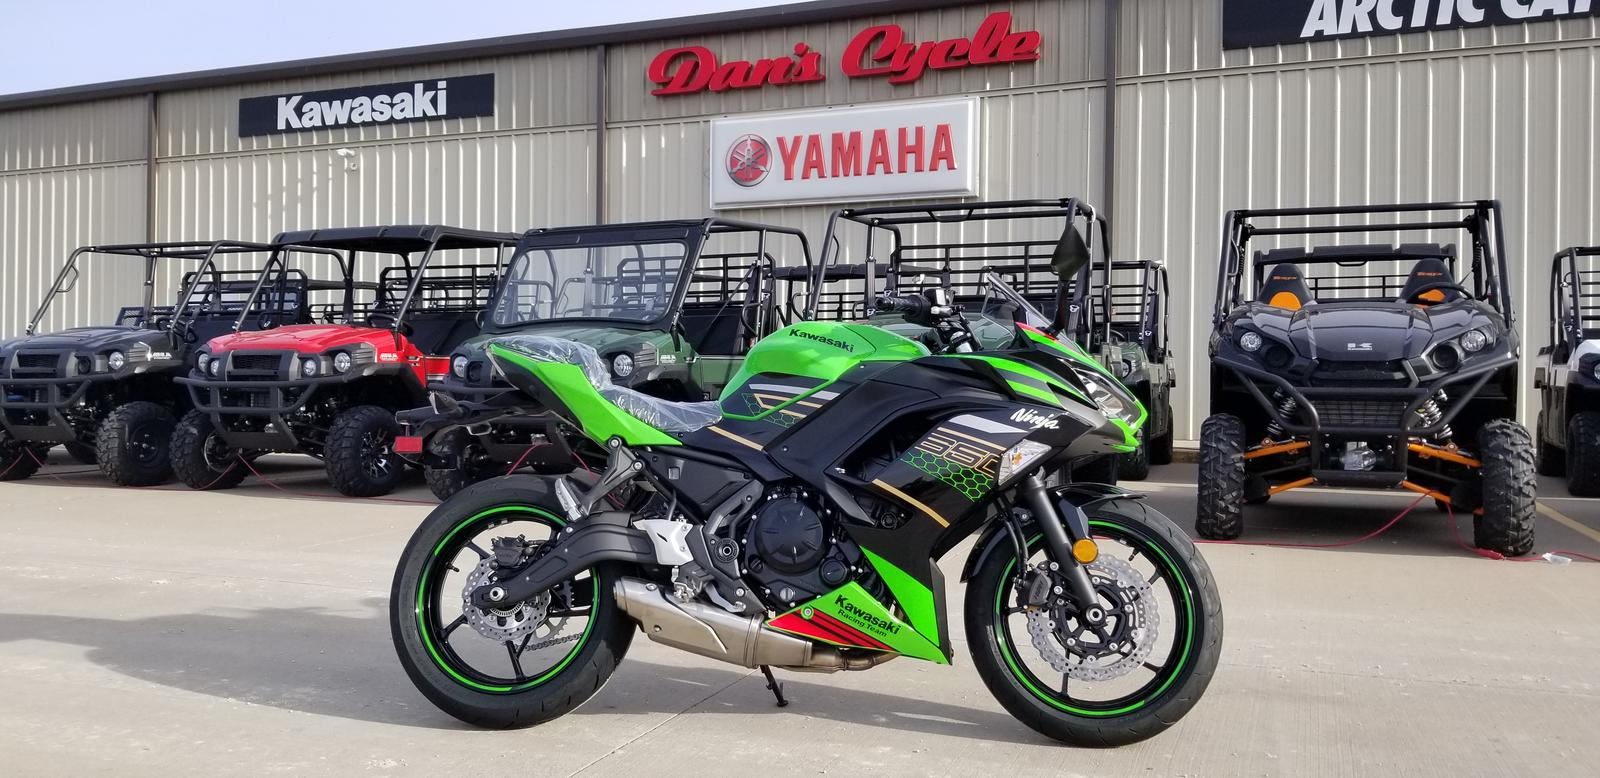 2020 Kawasaki Ninja 650 Krt Edition For Sale In Hesston Ks Dan S Cycle 620 327 5001